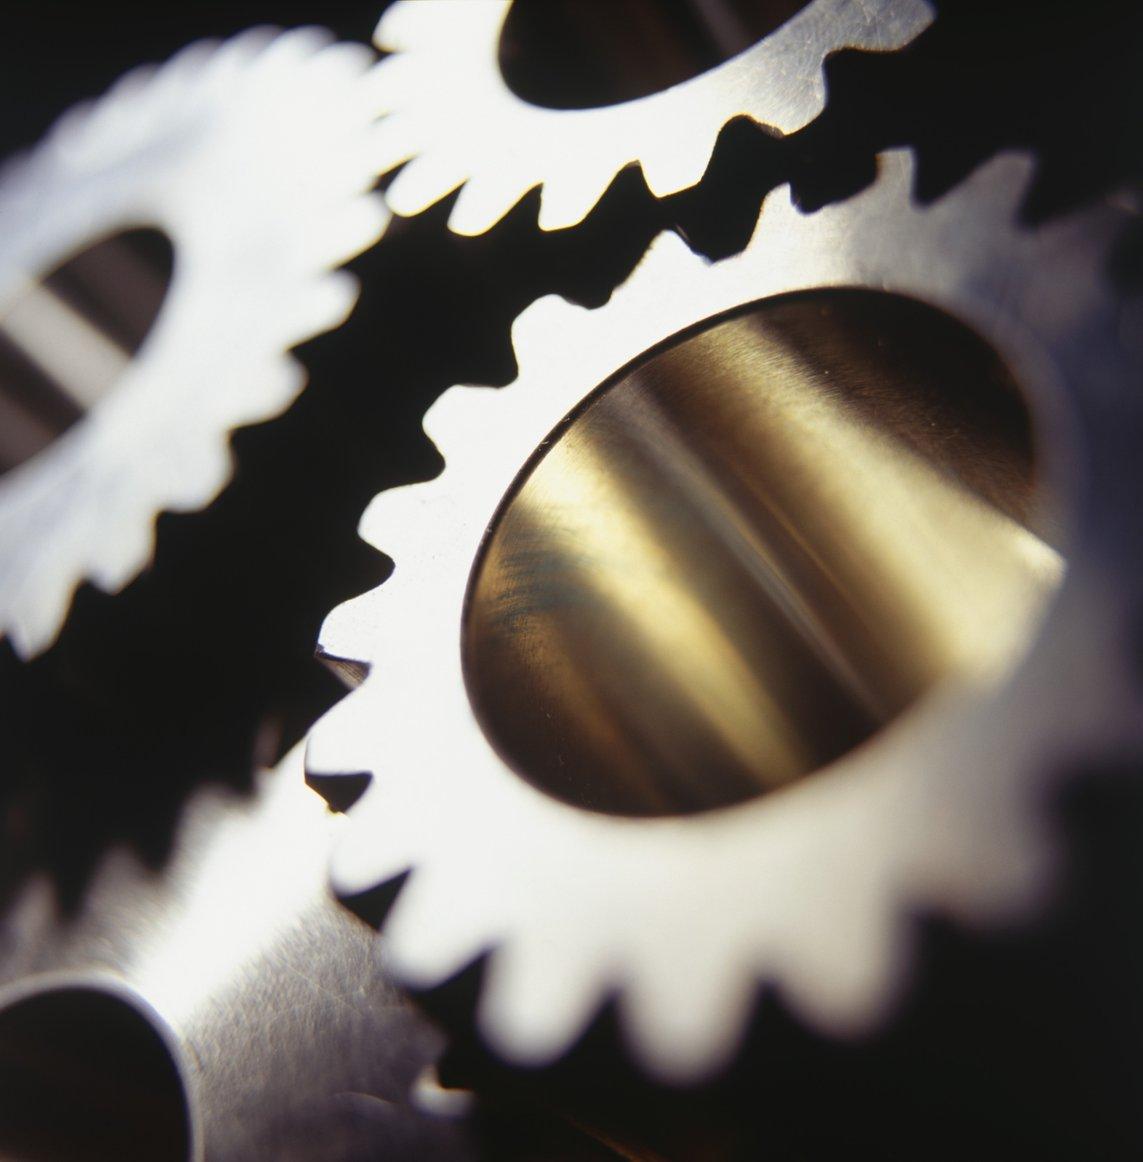 manufacturerscreateconsistentcontent